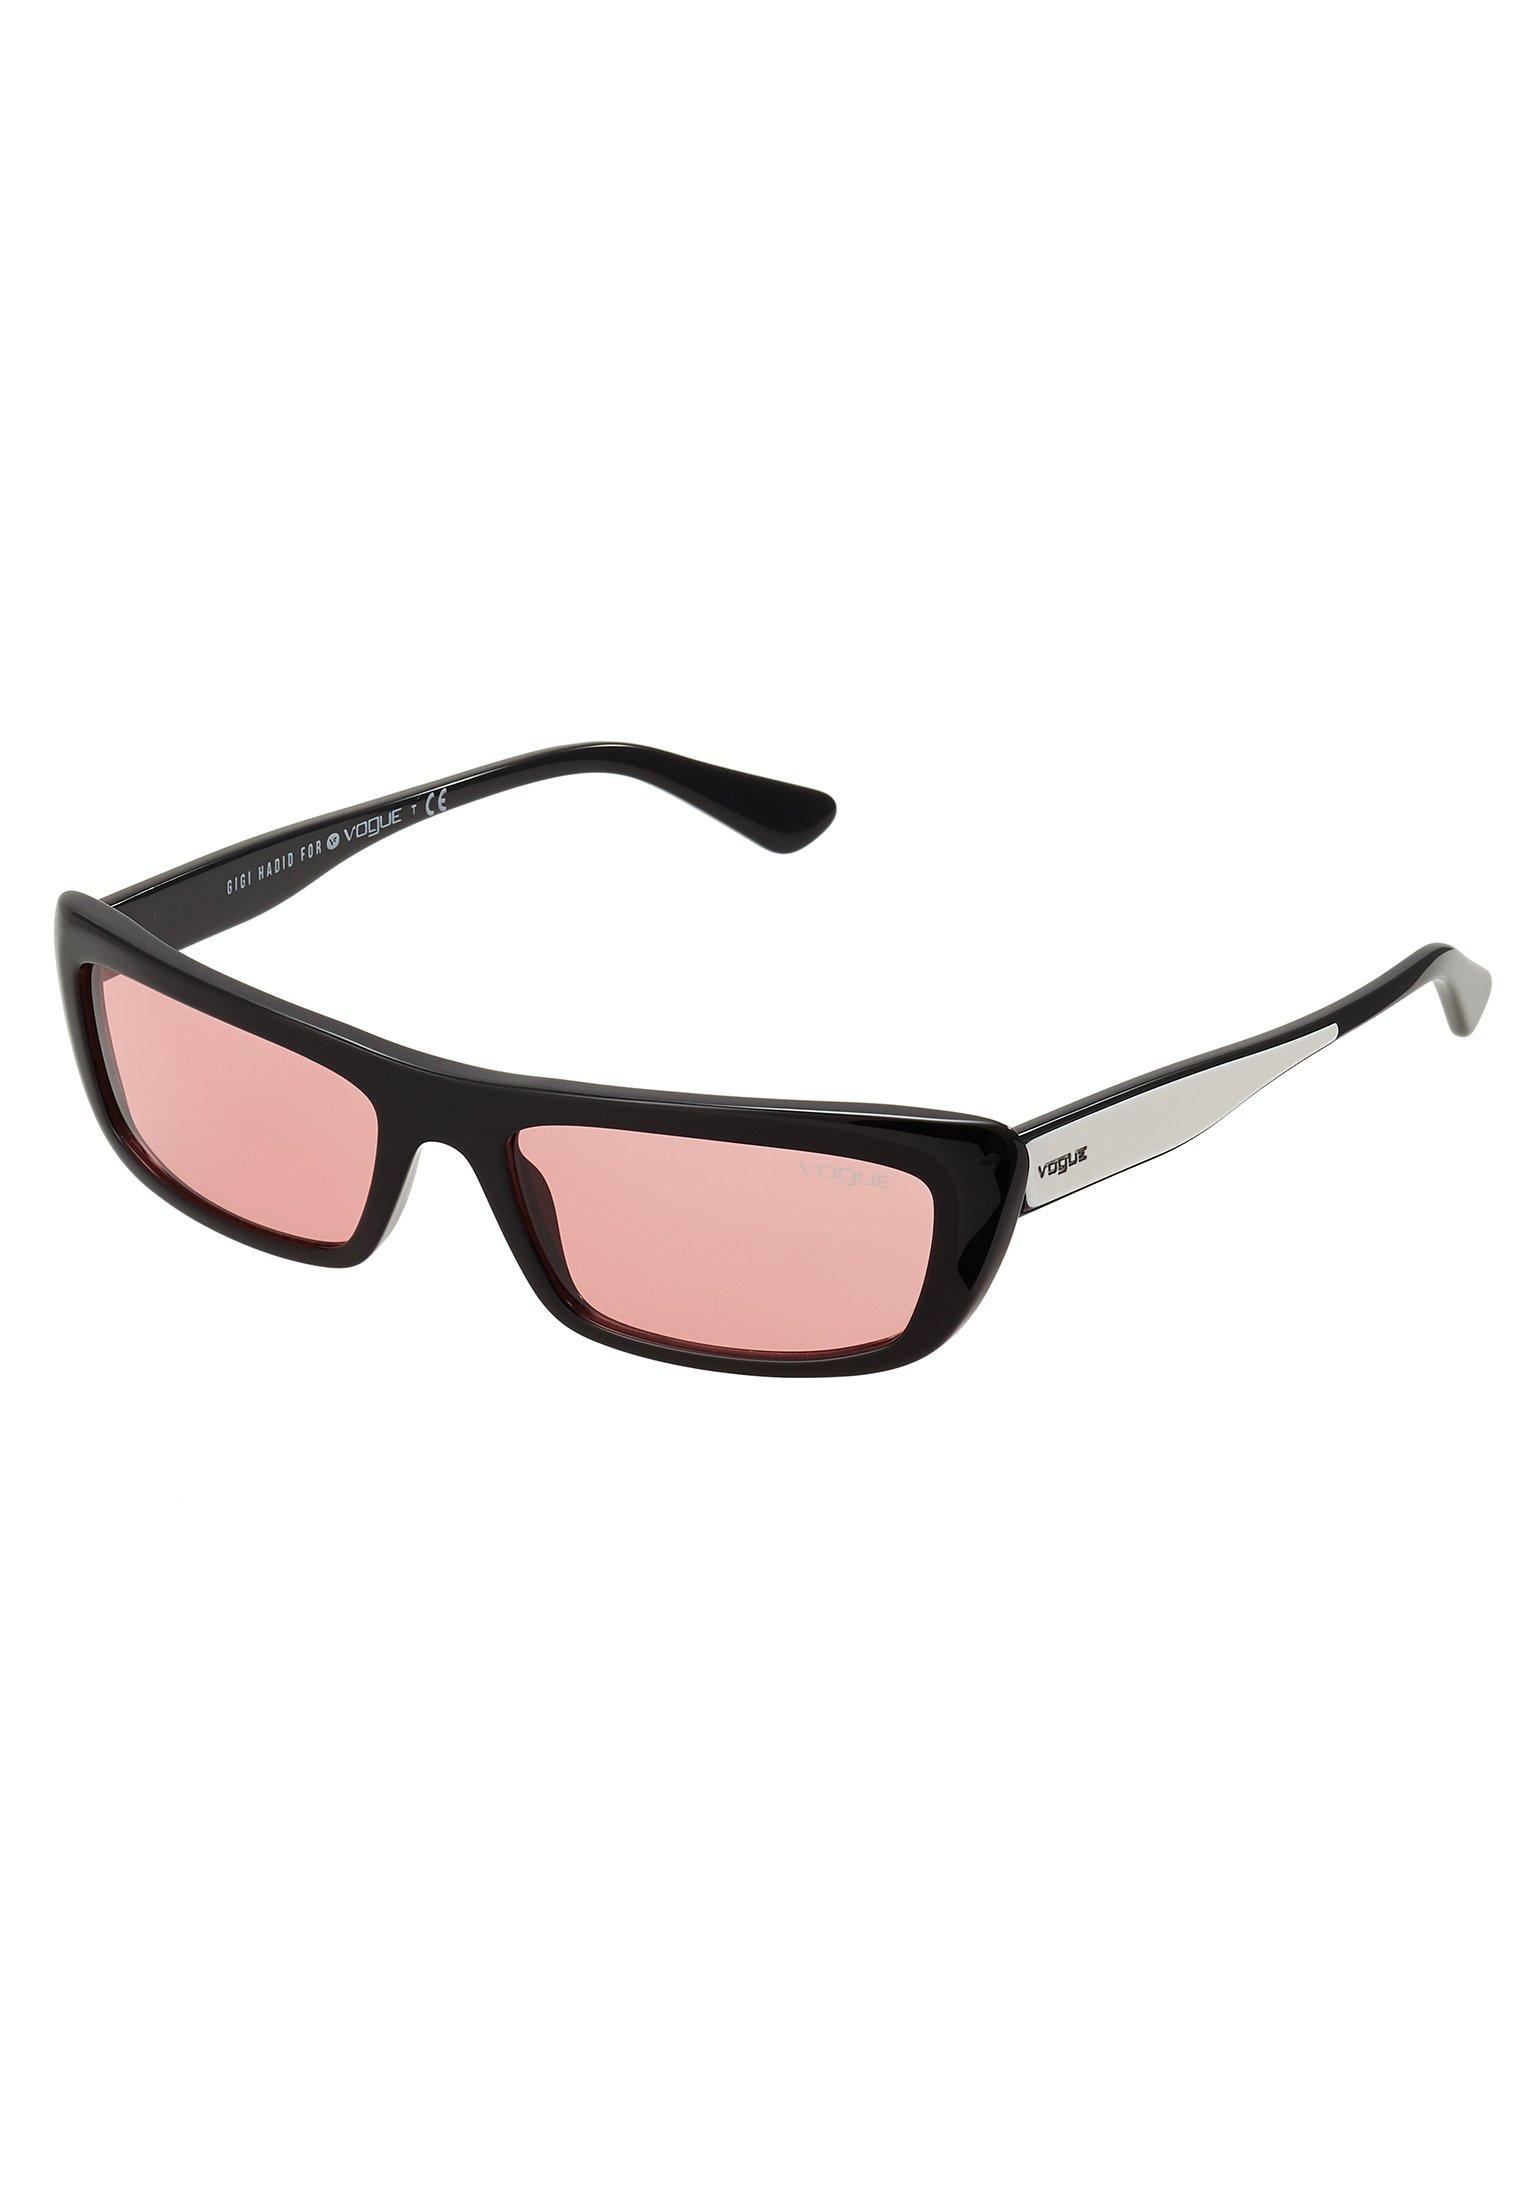 VOGUE Eyewear GIGI HADID BELLA - Sunglasses - black